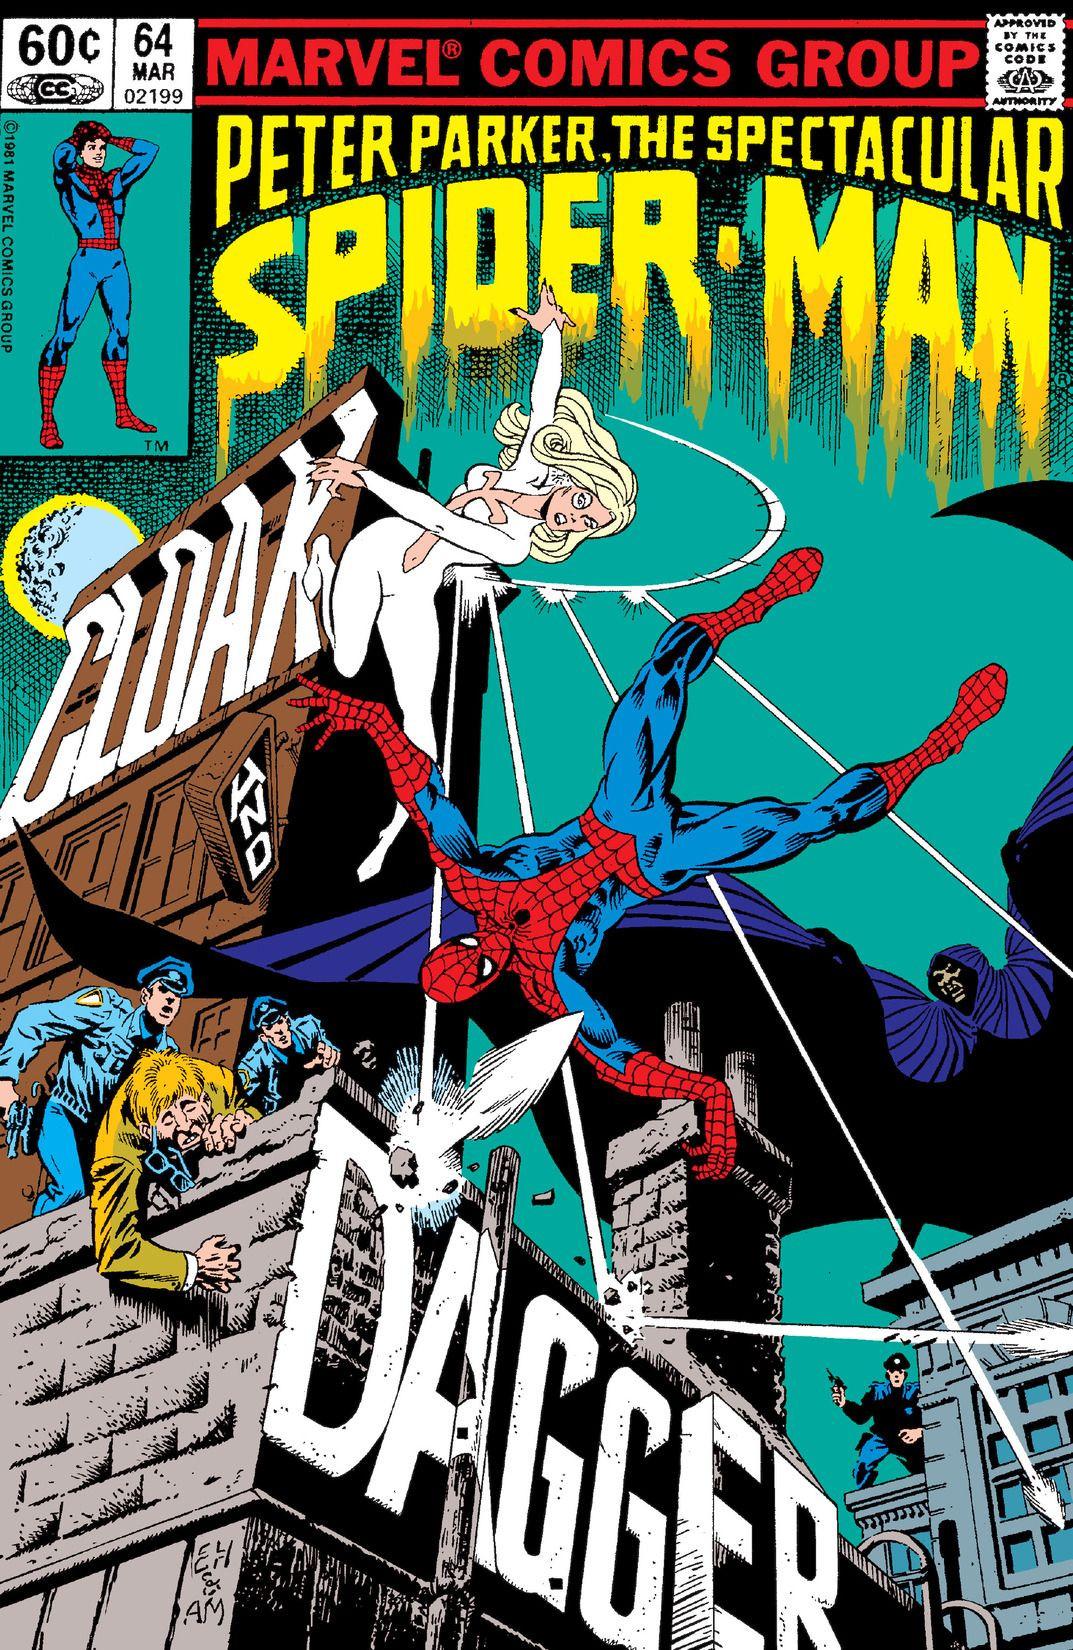 Peter Parker, The Spectacular Spider-Man Vol 1 64.jpg